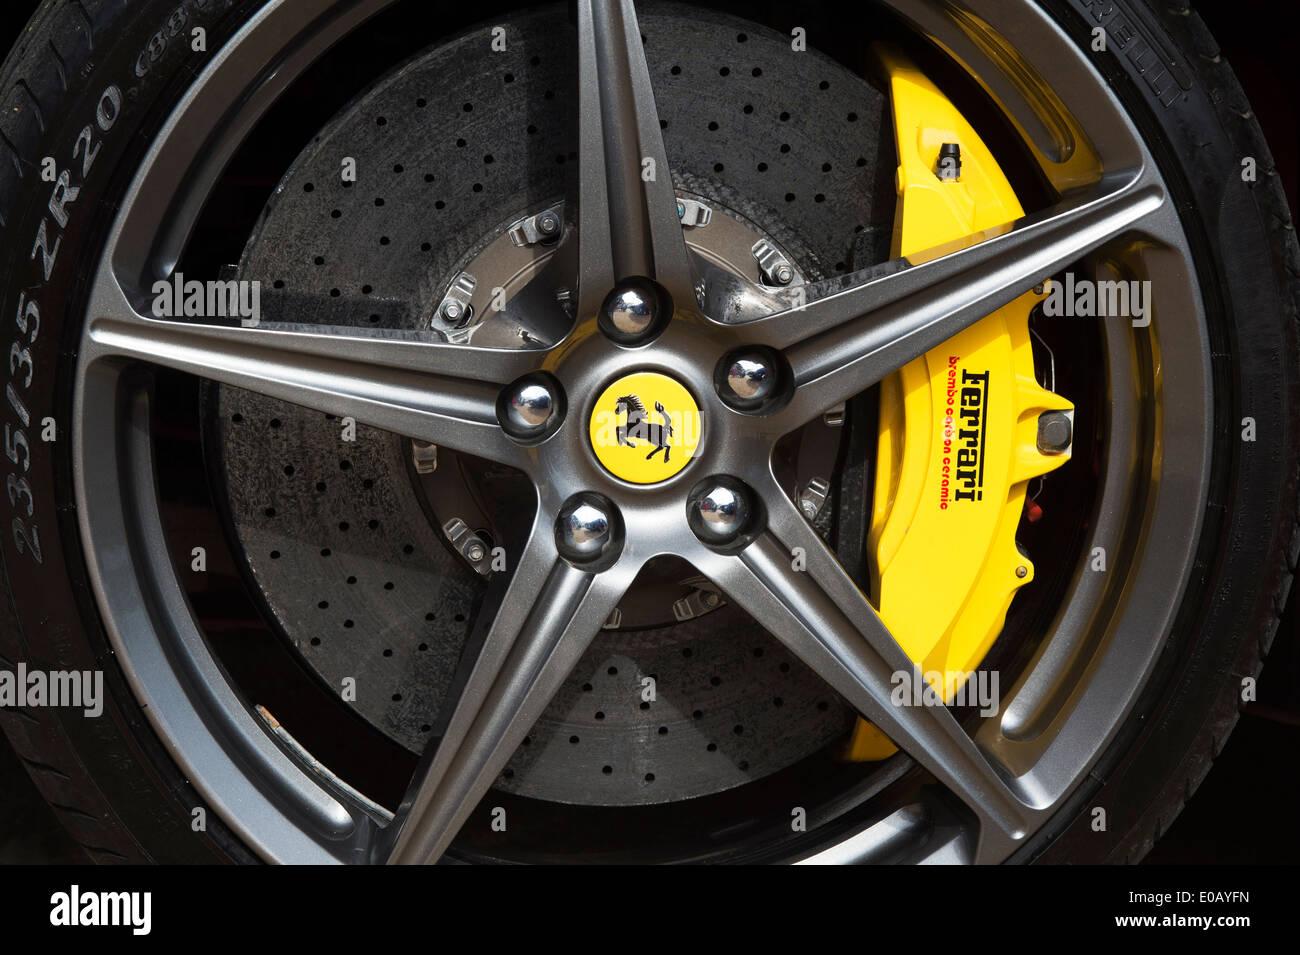 Ferrari wheel showing brake caliper - Stock Image